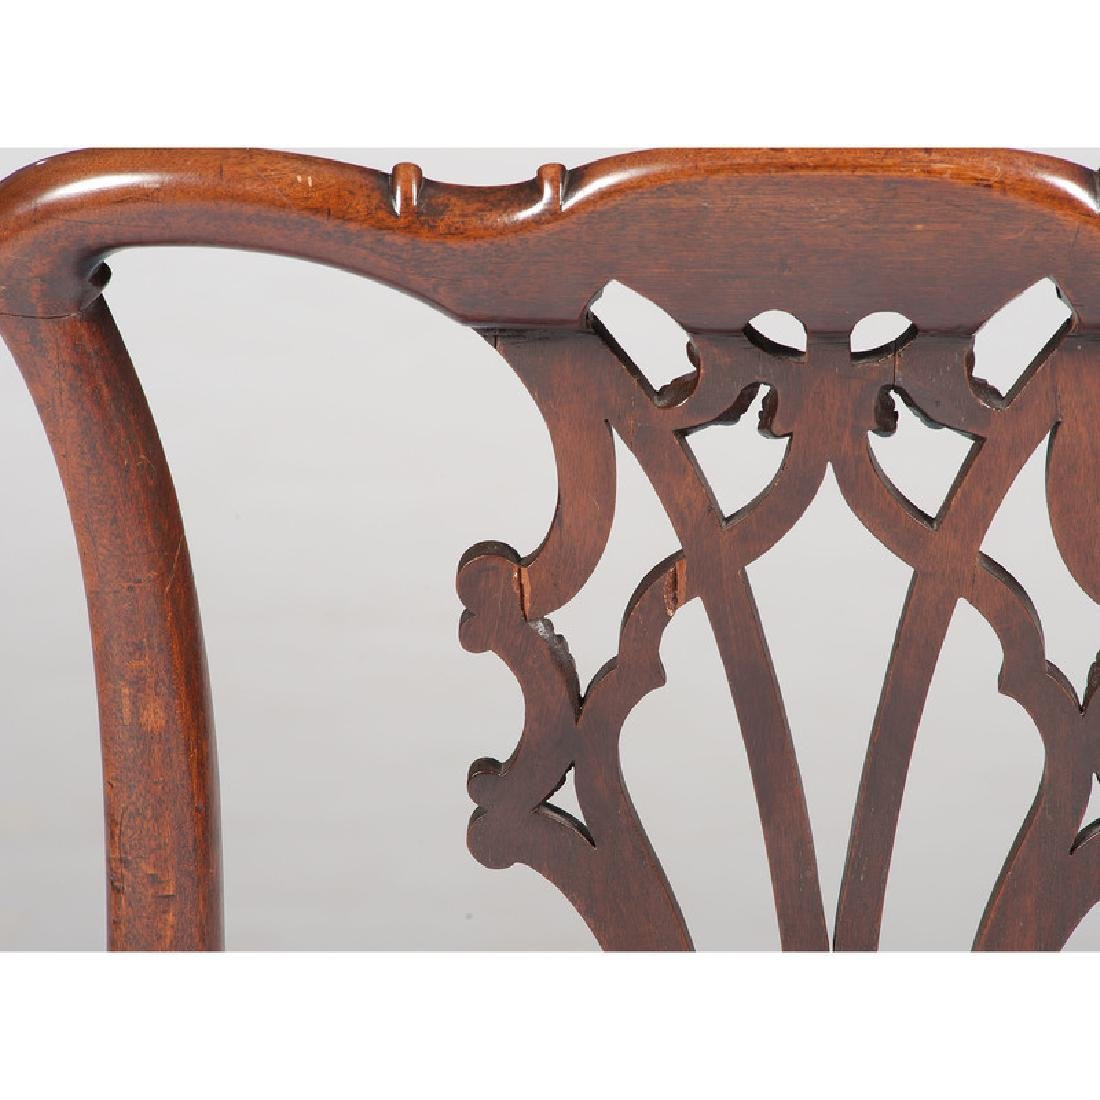 Twelve George III Chippendale Chairs - 5